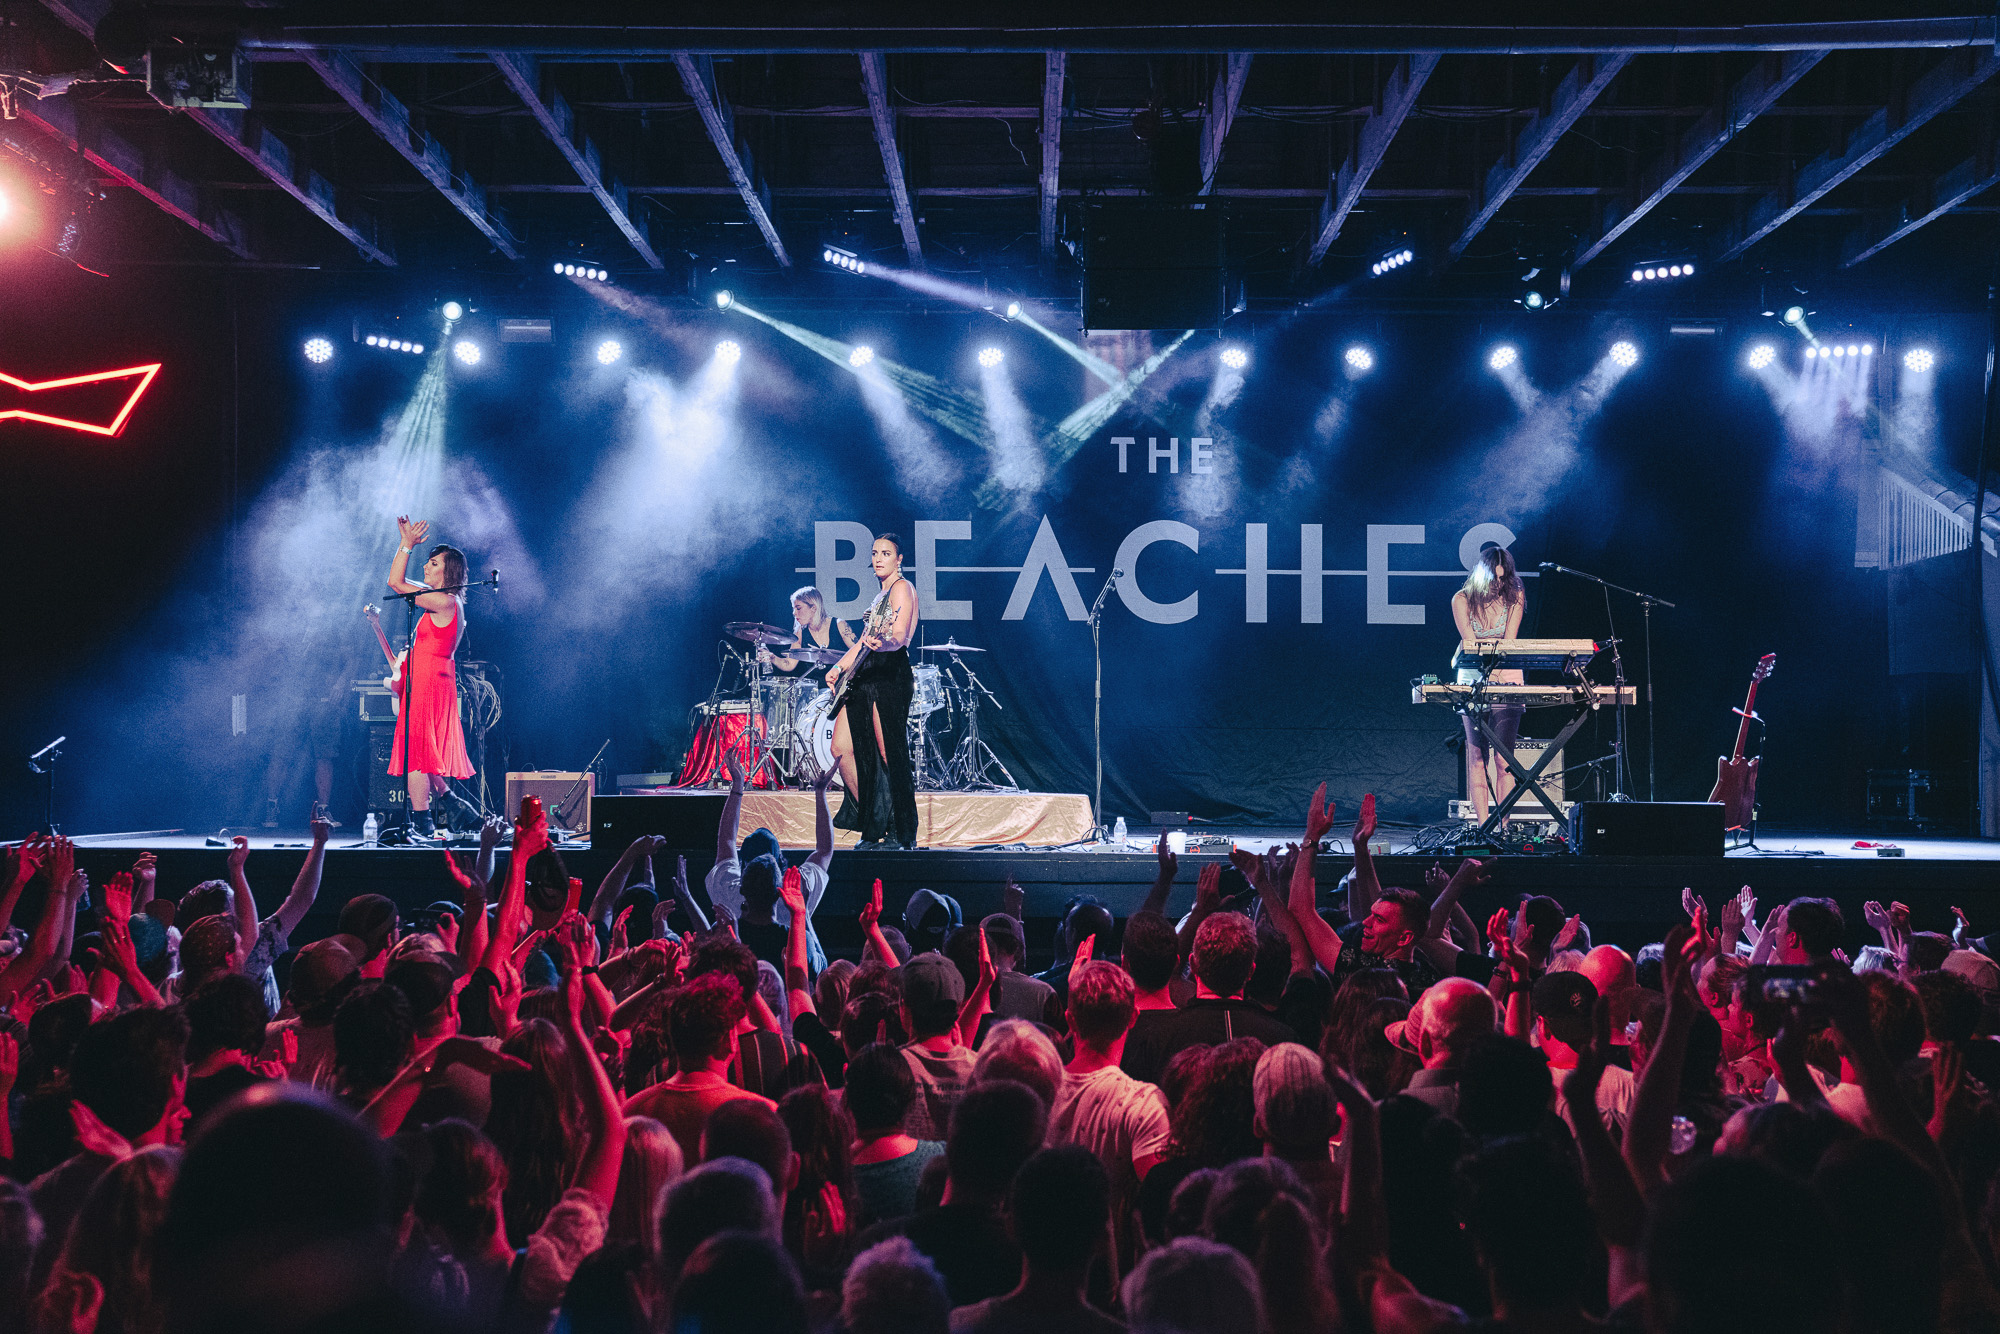 The_Beaches_Bala_15.jpg